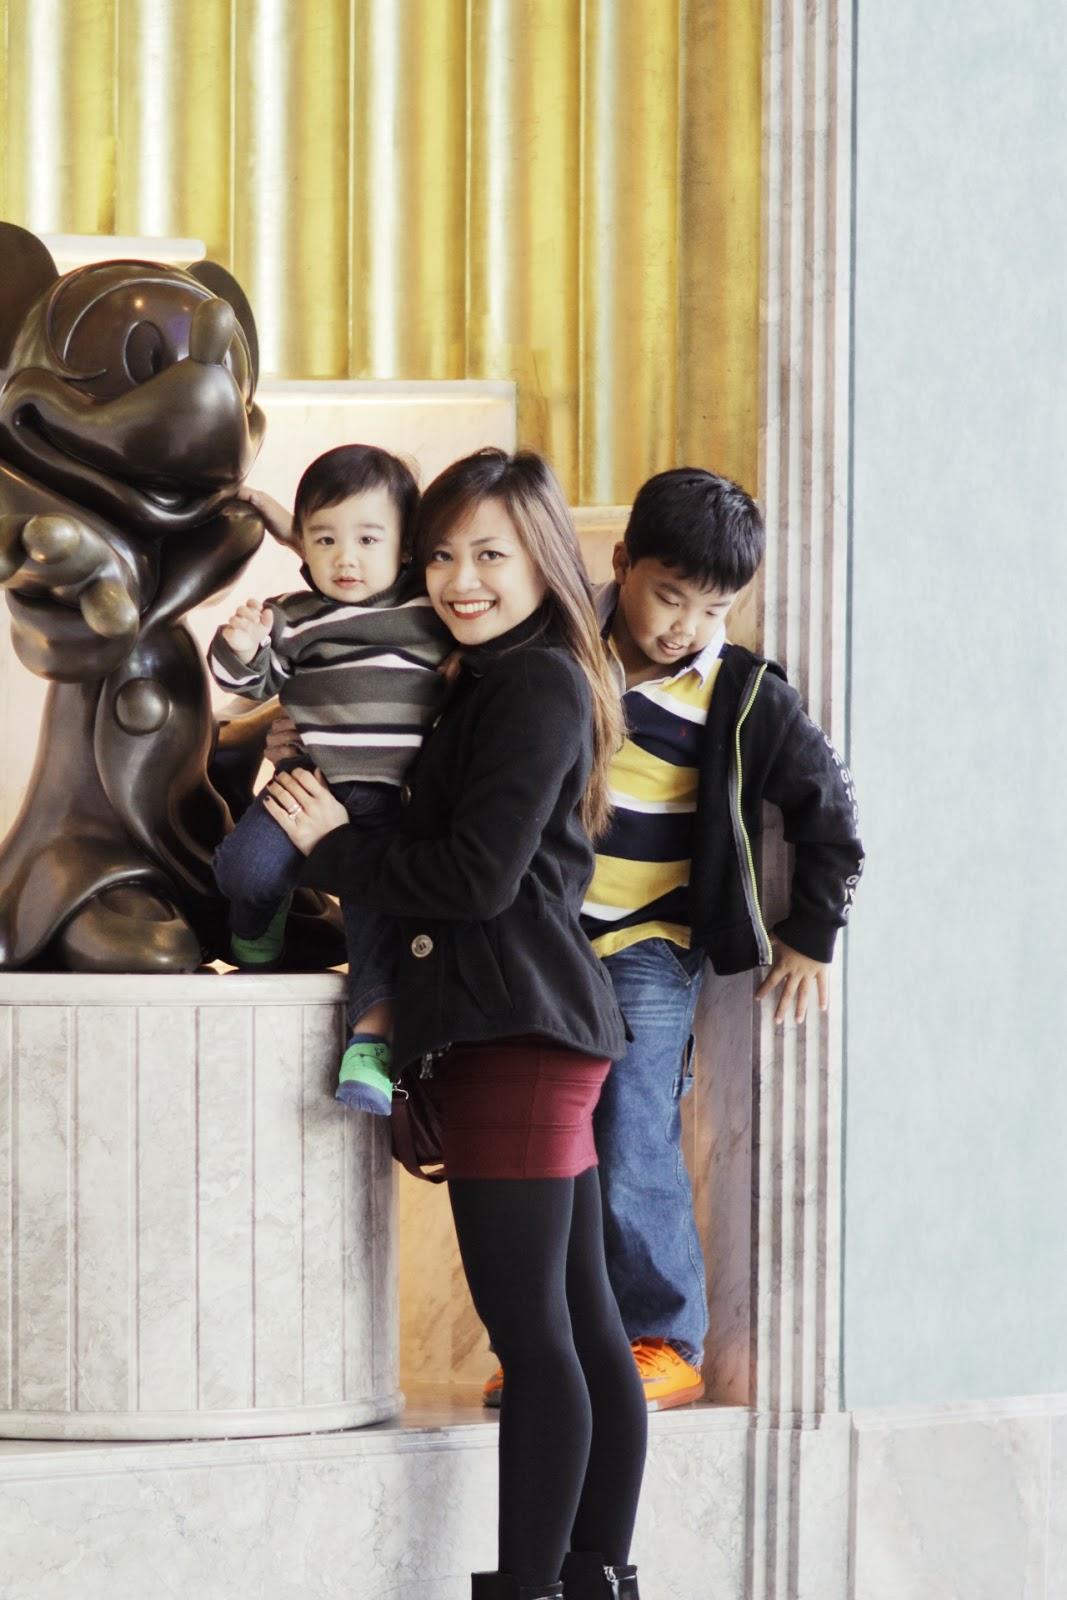 Balenciaga, Hong Kong, Travel, tourist, Christmas 2013, Disneyland